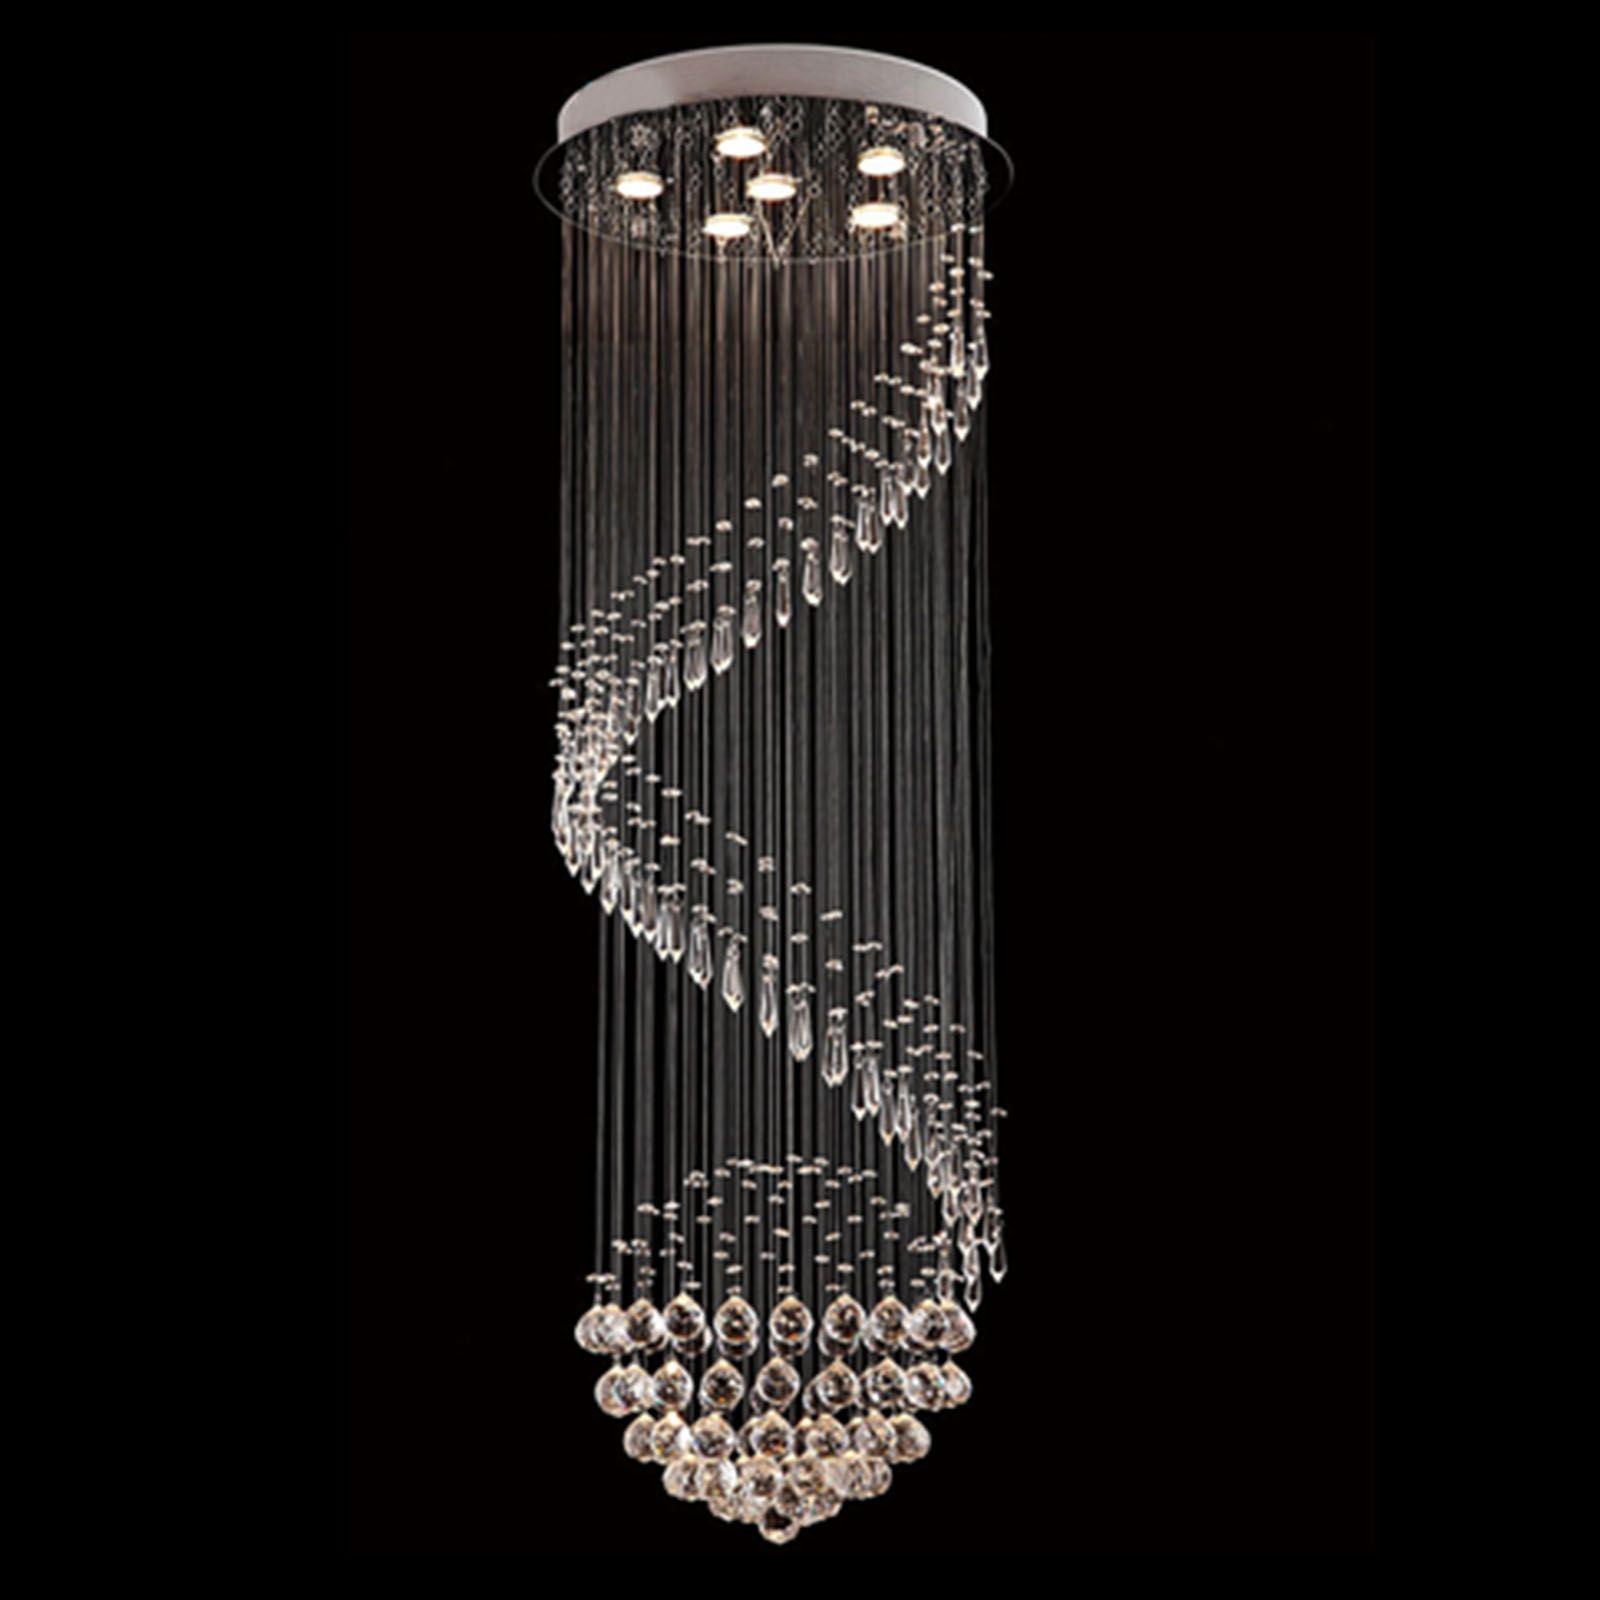 Byb modern chandelier rain drop lighting spiral wave crystal ball byb modern chandelier rain drop lighting spiral wave crystal ball fixture pendant ceiling lamp arubaitofo Gallery